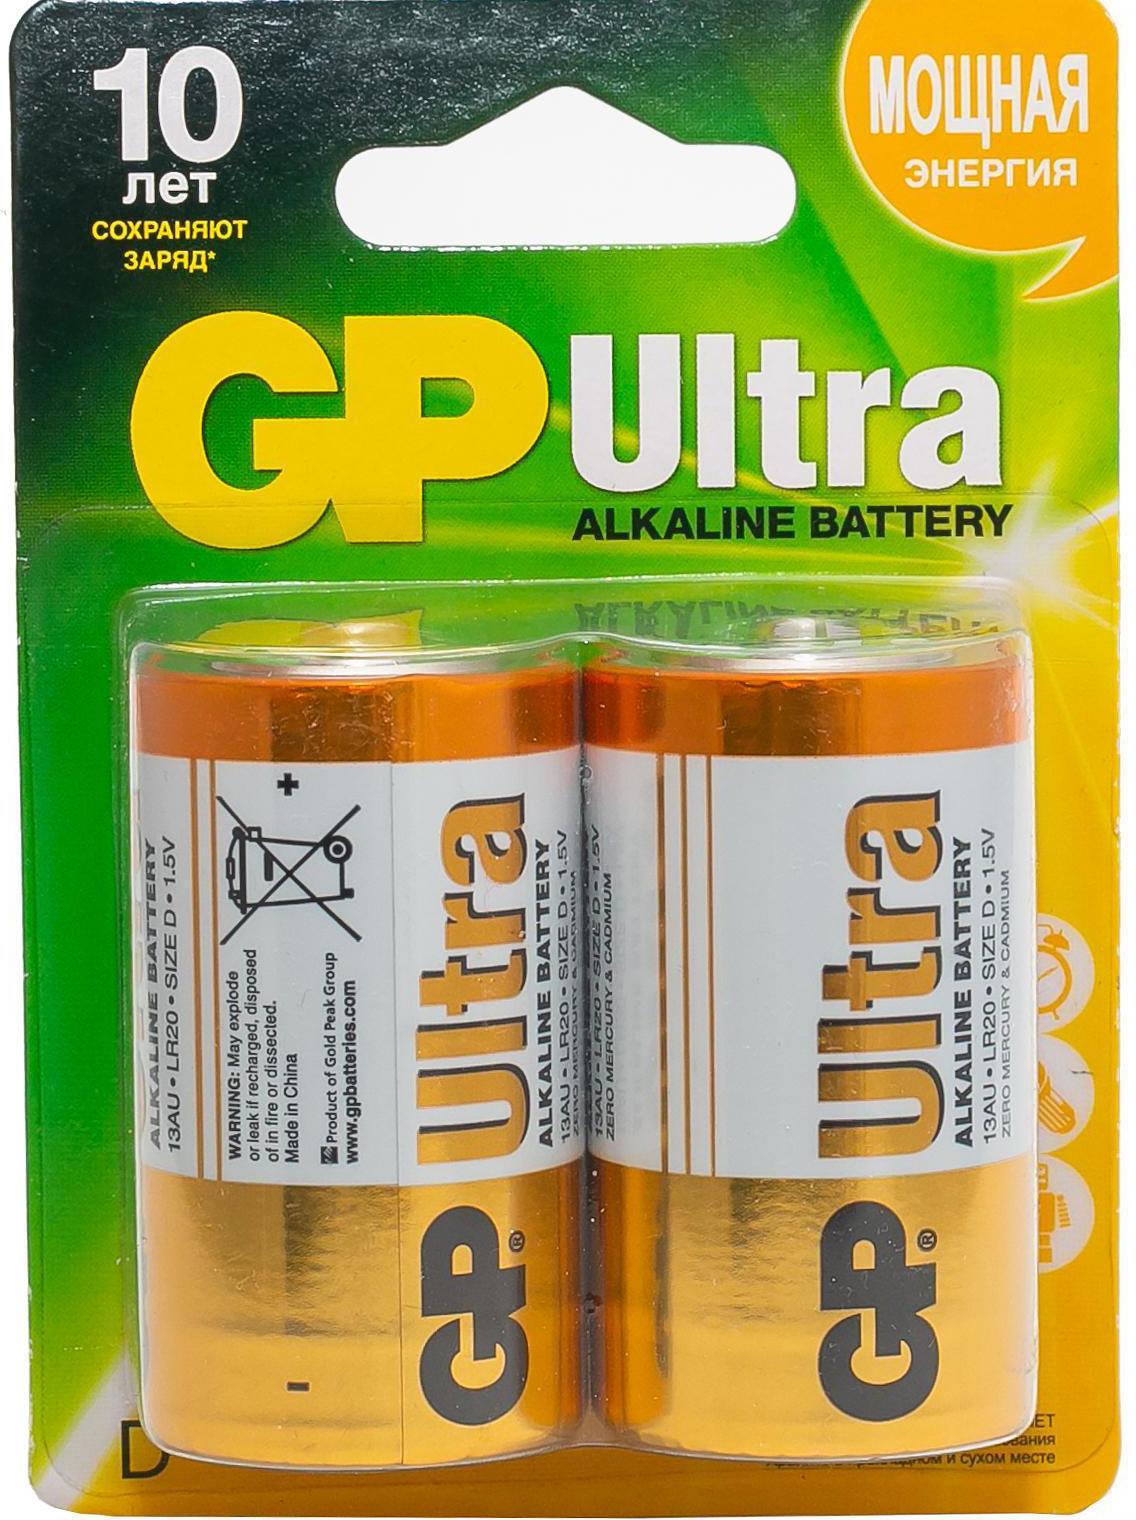 Фото - Алкалиновые батарейки GP Ultra Alkaline 13А типоразмера D (Блистер, 2 шт) алкалиновые батарейки gp ultra alkaline 13а типоразмера d блистер 2 шт